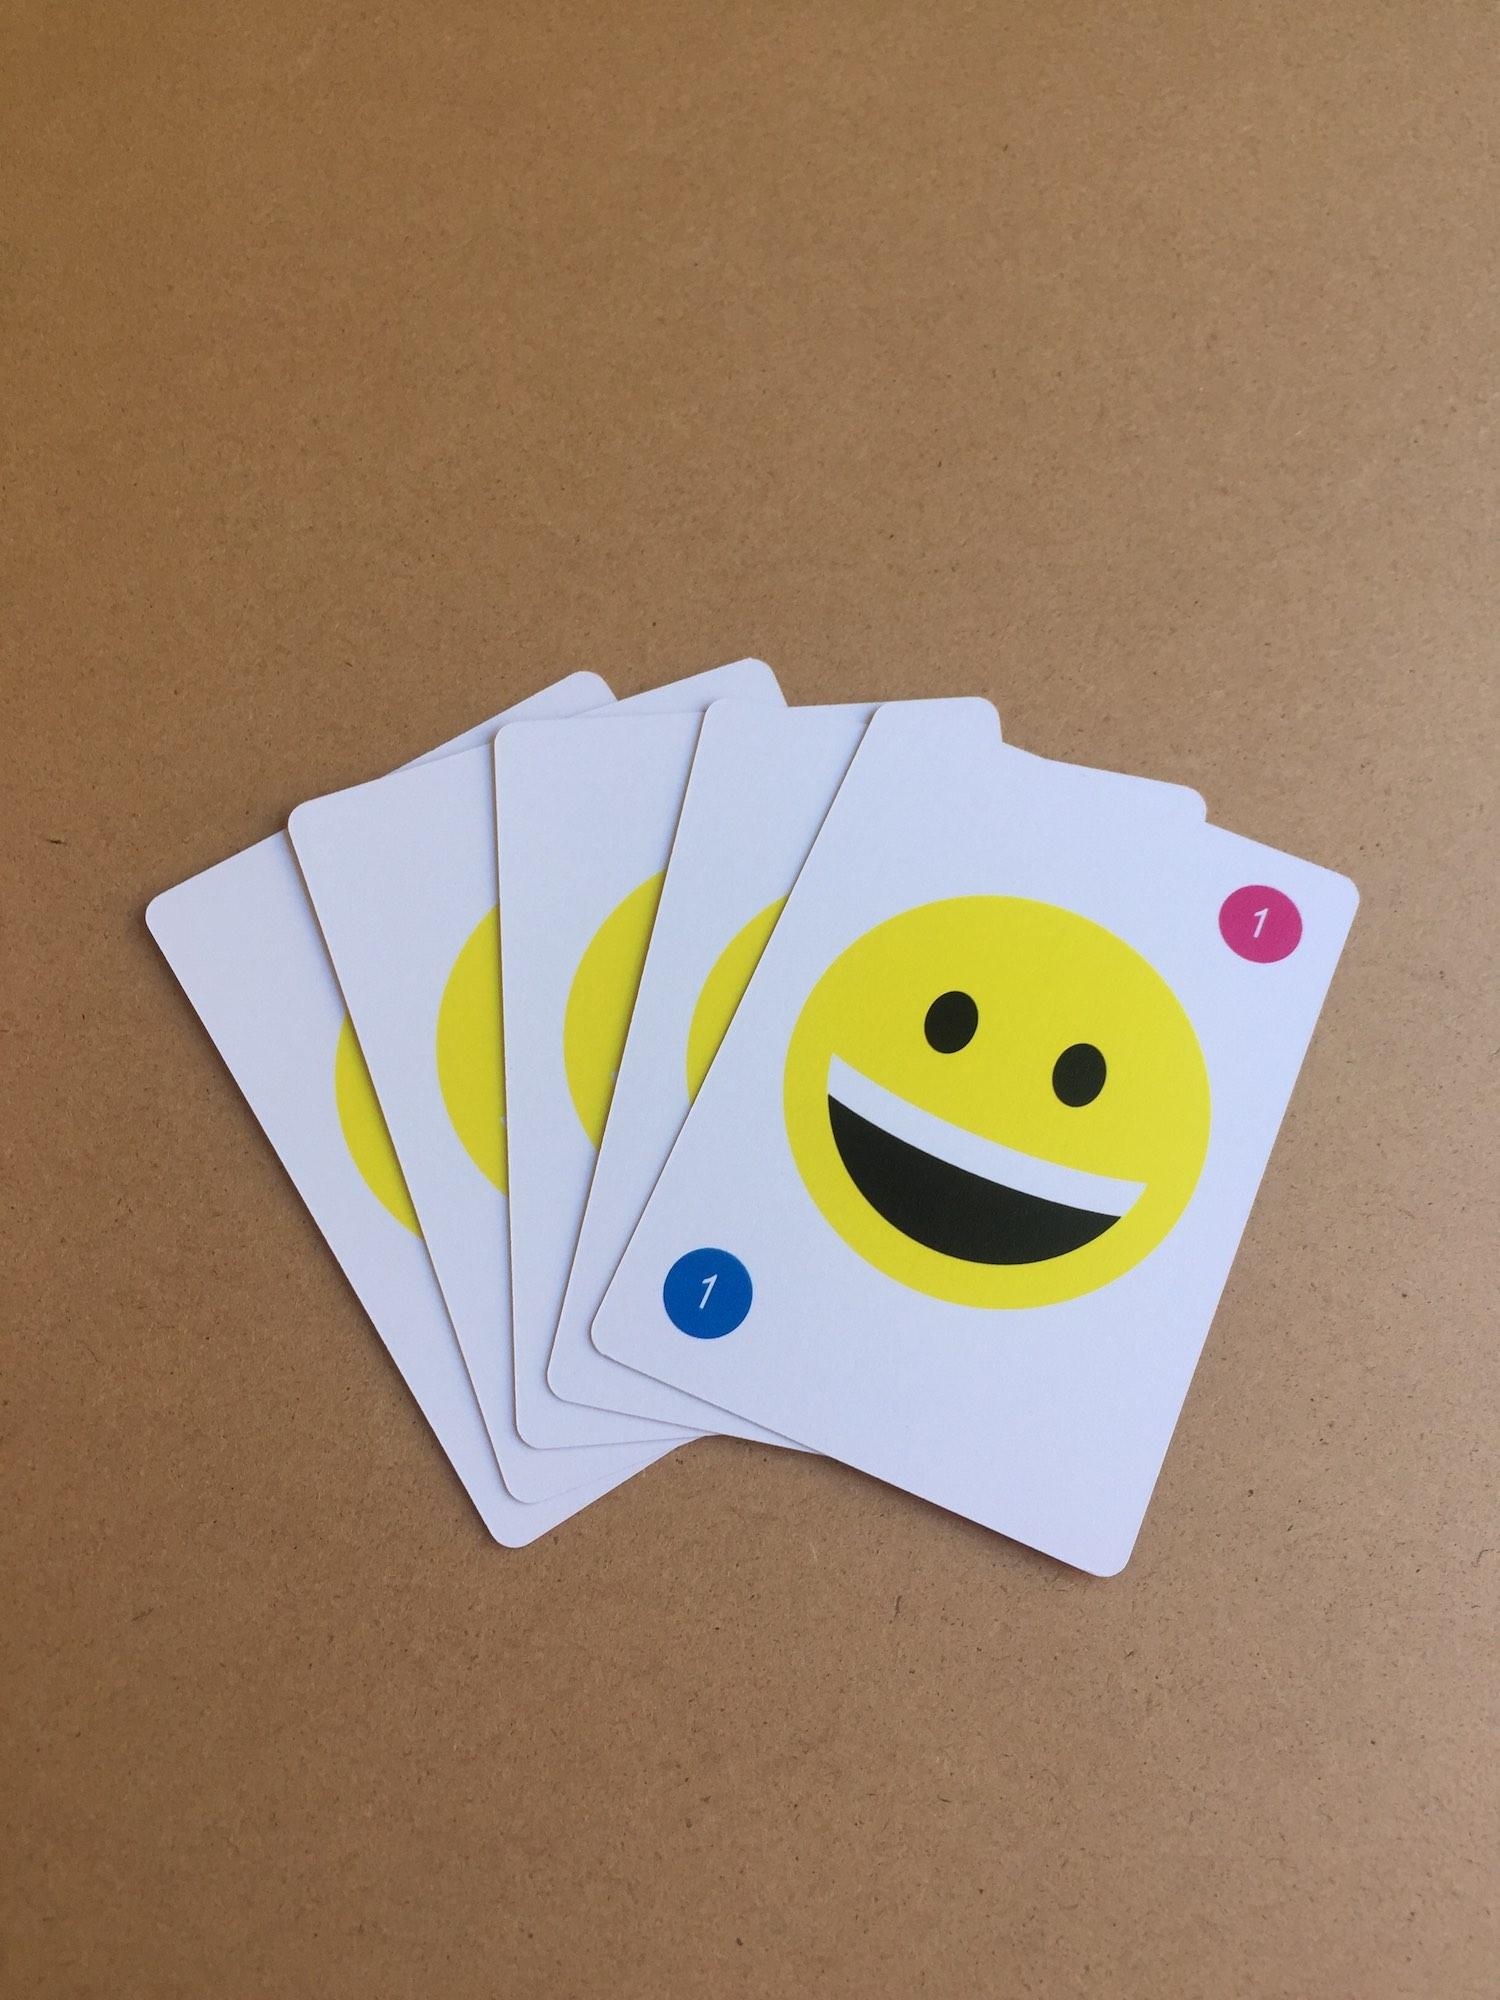 Totes Emosh Card Game